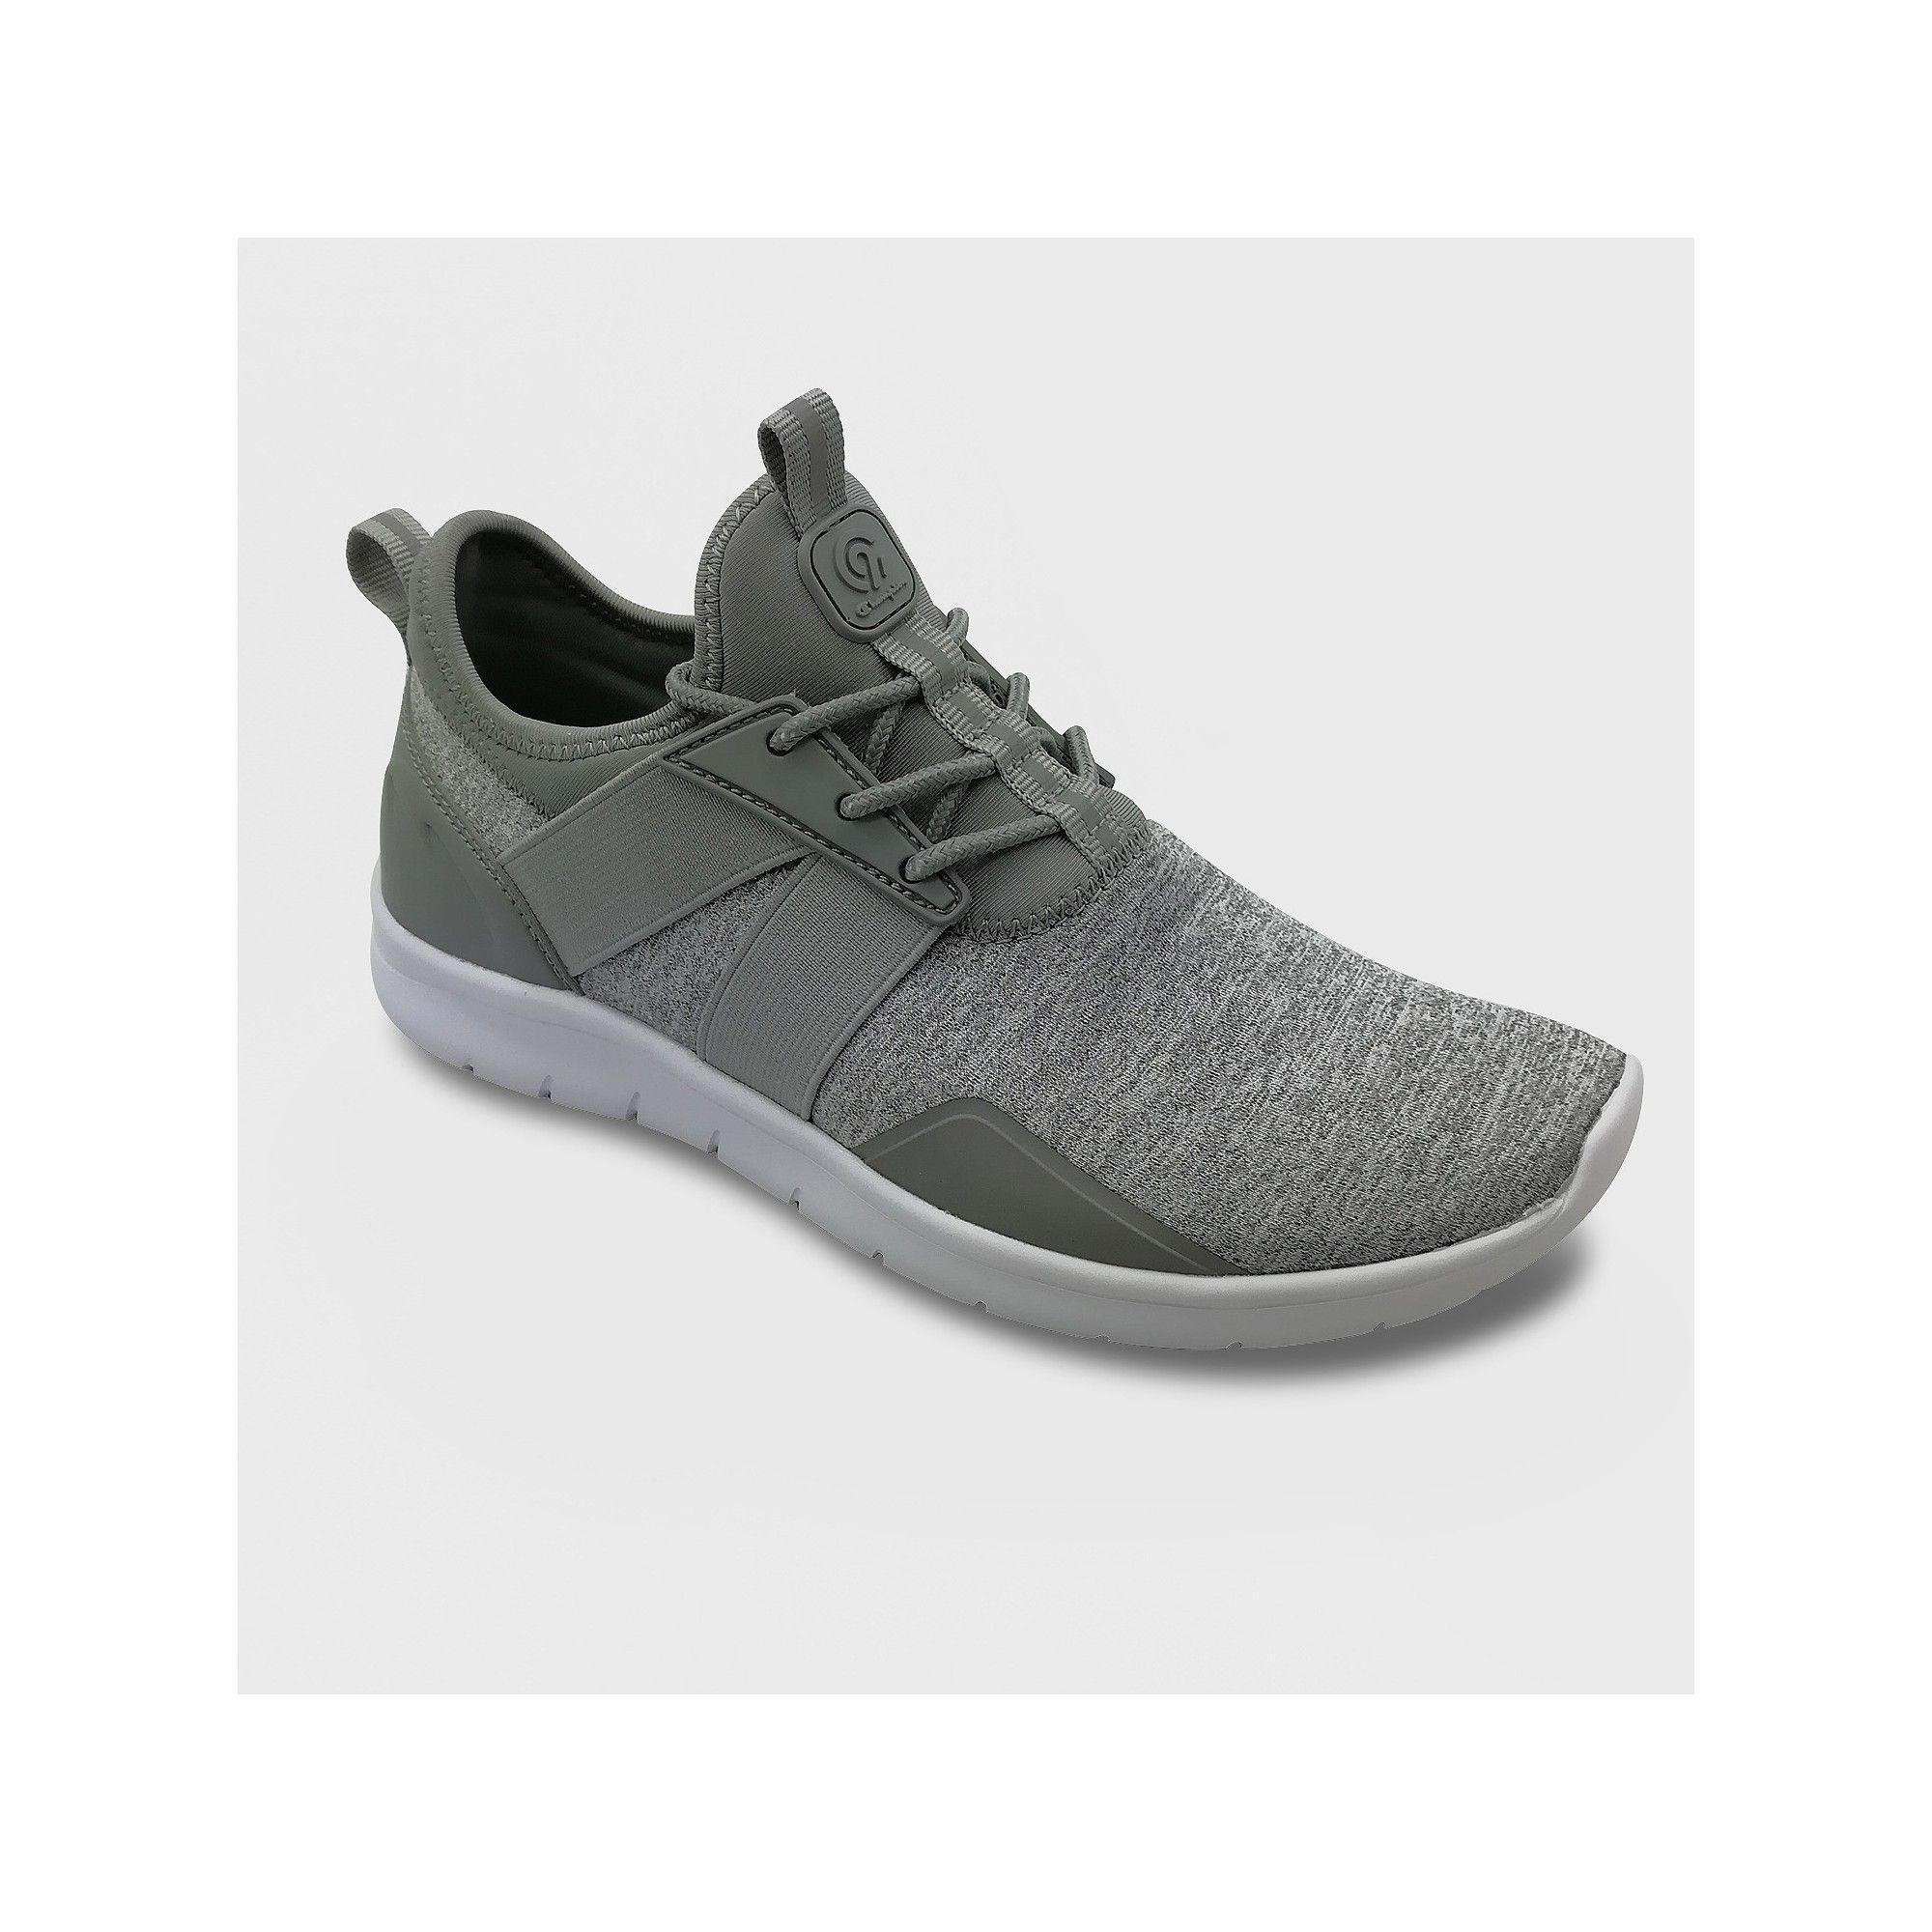 66e6551c Women's Drive 4 Spacedye Wide Width Heathered Sneakers - C9 Champion Gray  7.5W